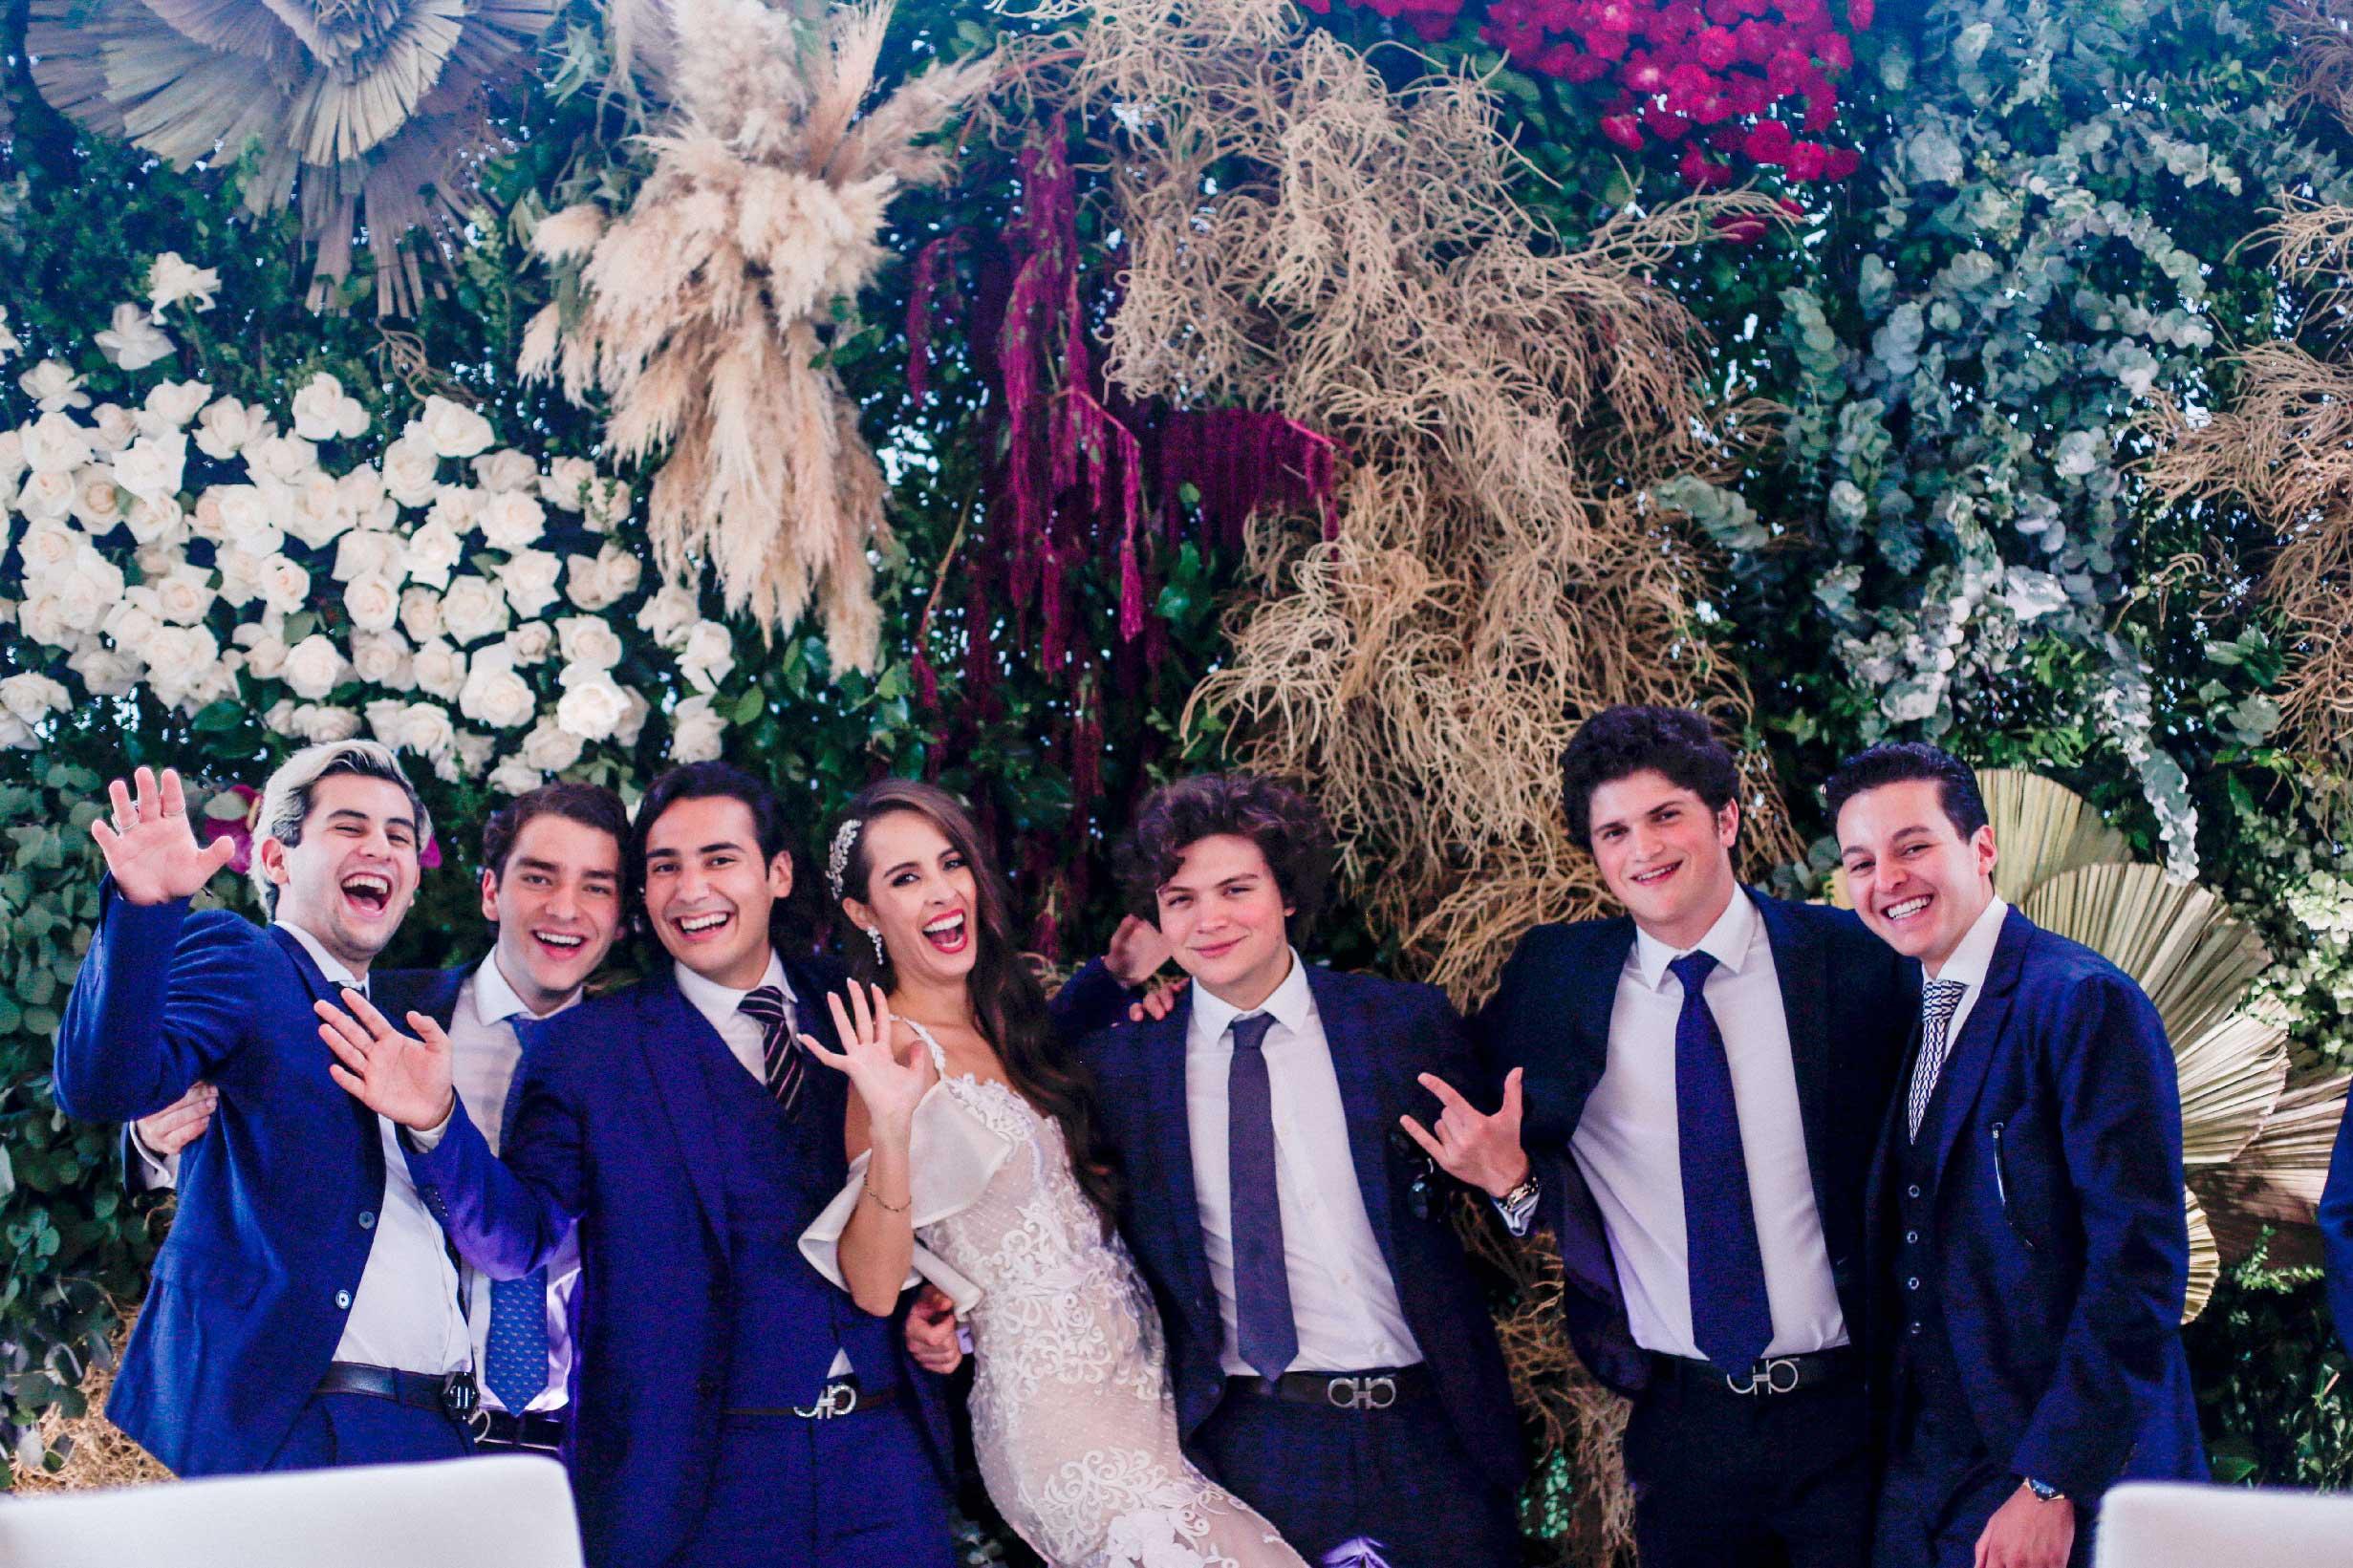 MARCO-MORENO---Jose-Pablo-Tovar,-Andres-Serio,-Salvador-González,-Gio,-Rafael-Mañón,-Patricio-Ostos,-Gabriel-El-Masri-3